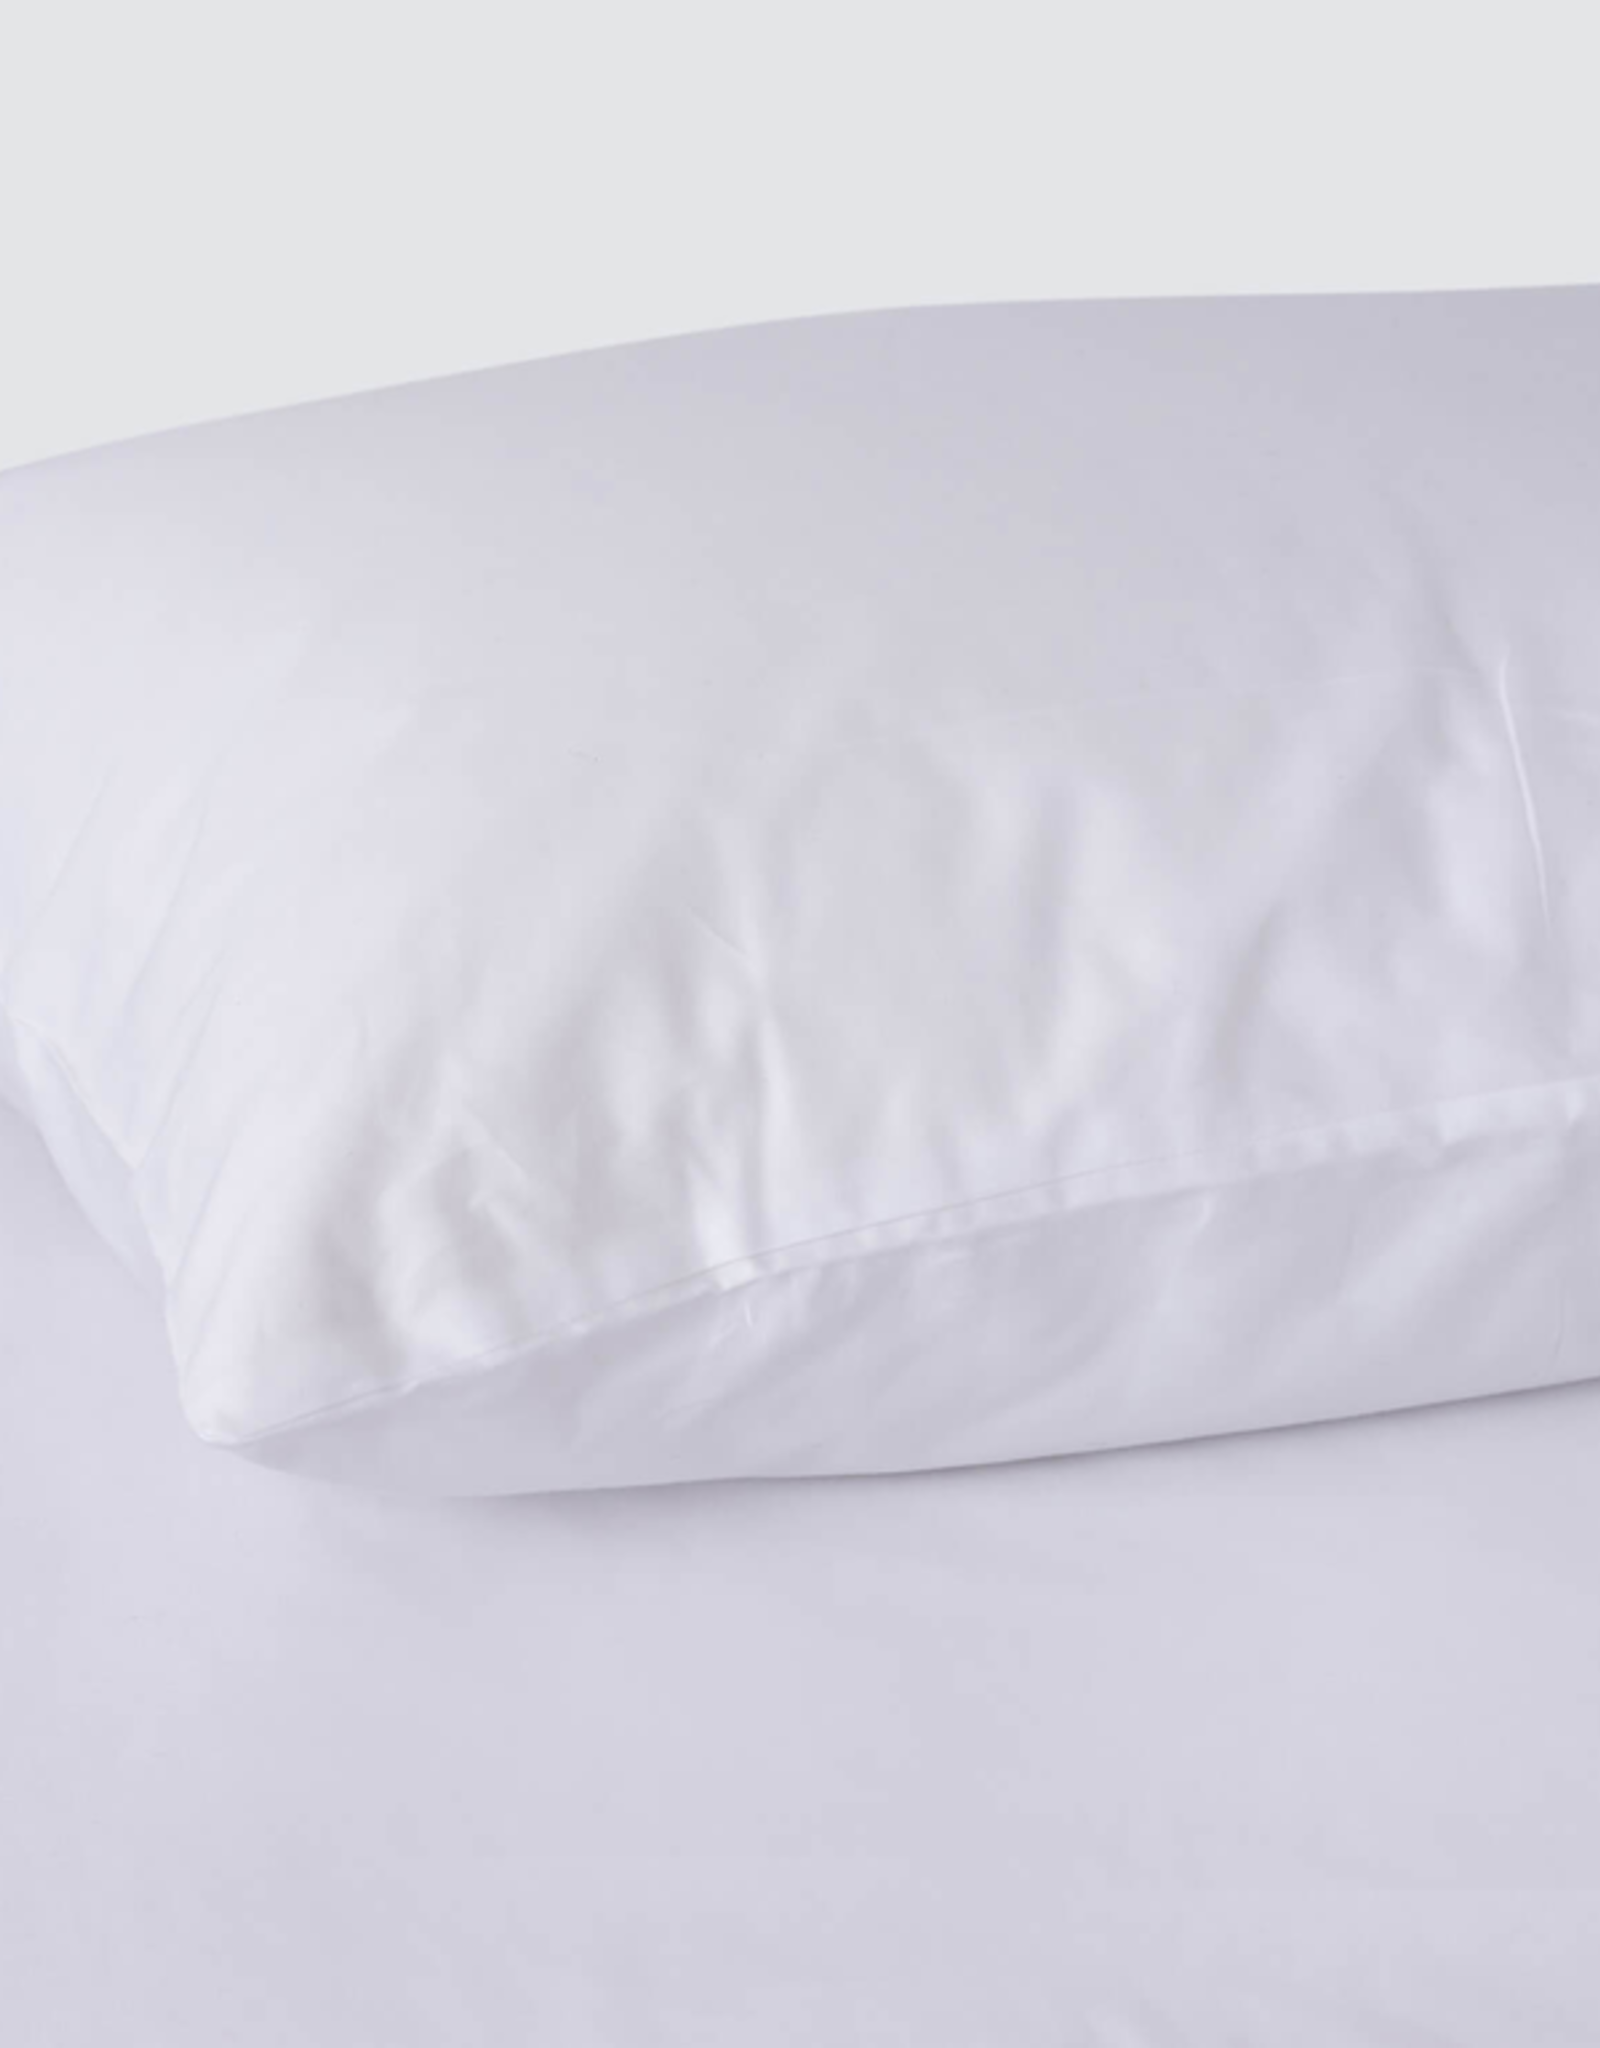 EQ3 EQ3 Egyptian Cotton King Sheet Set-White